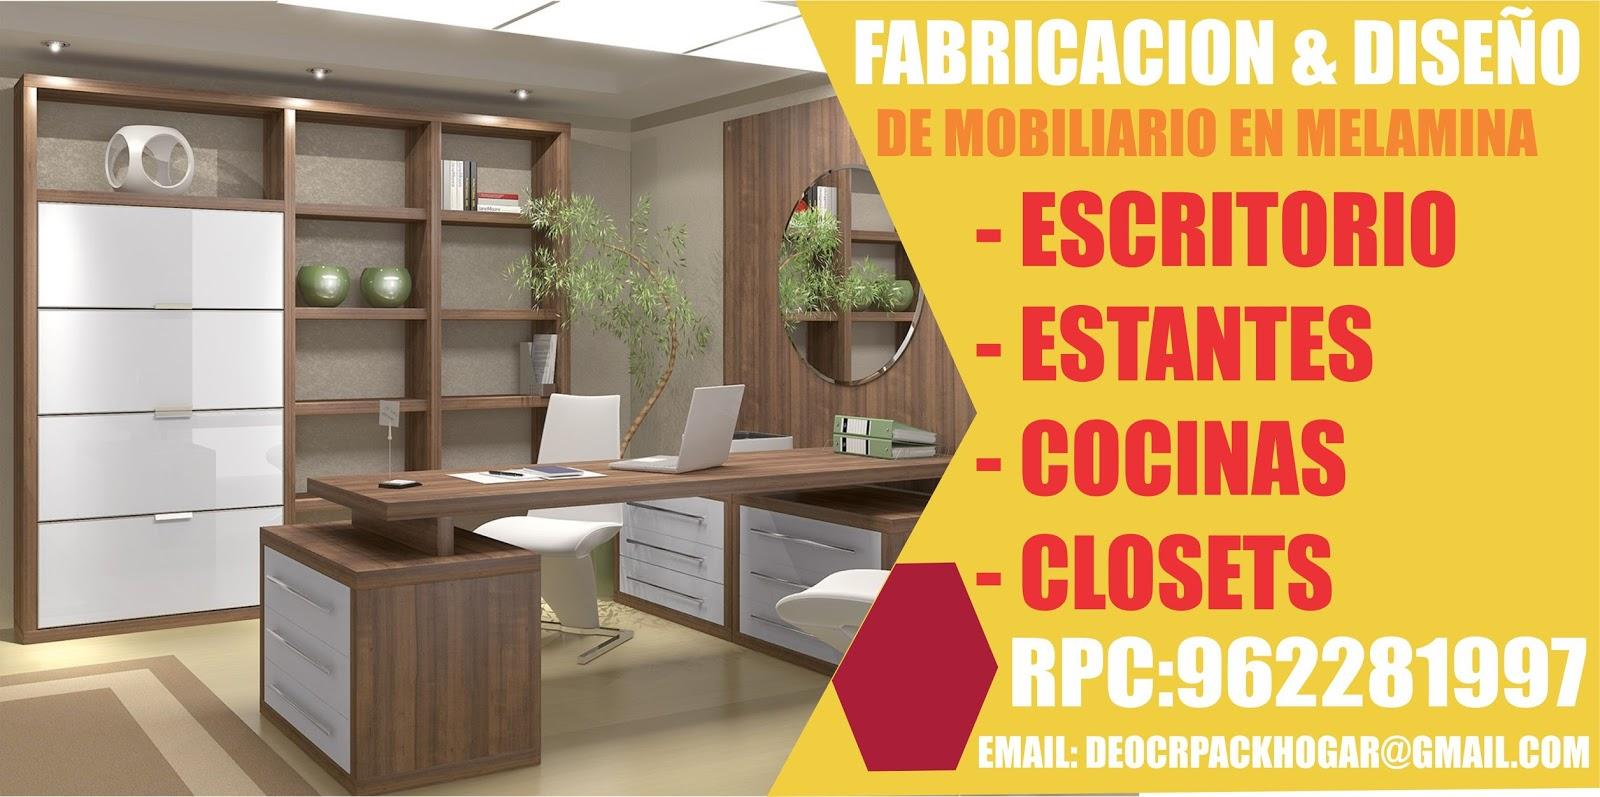 Dise os fabricacion de closet cocina y muebles de oficina for Escritorios de oficina lima